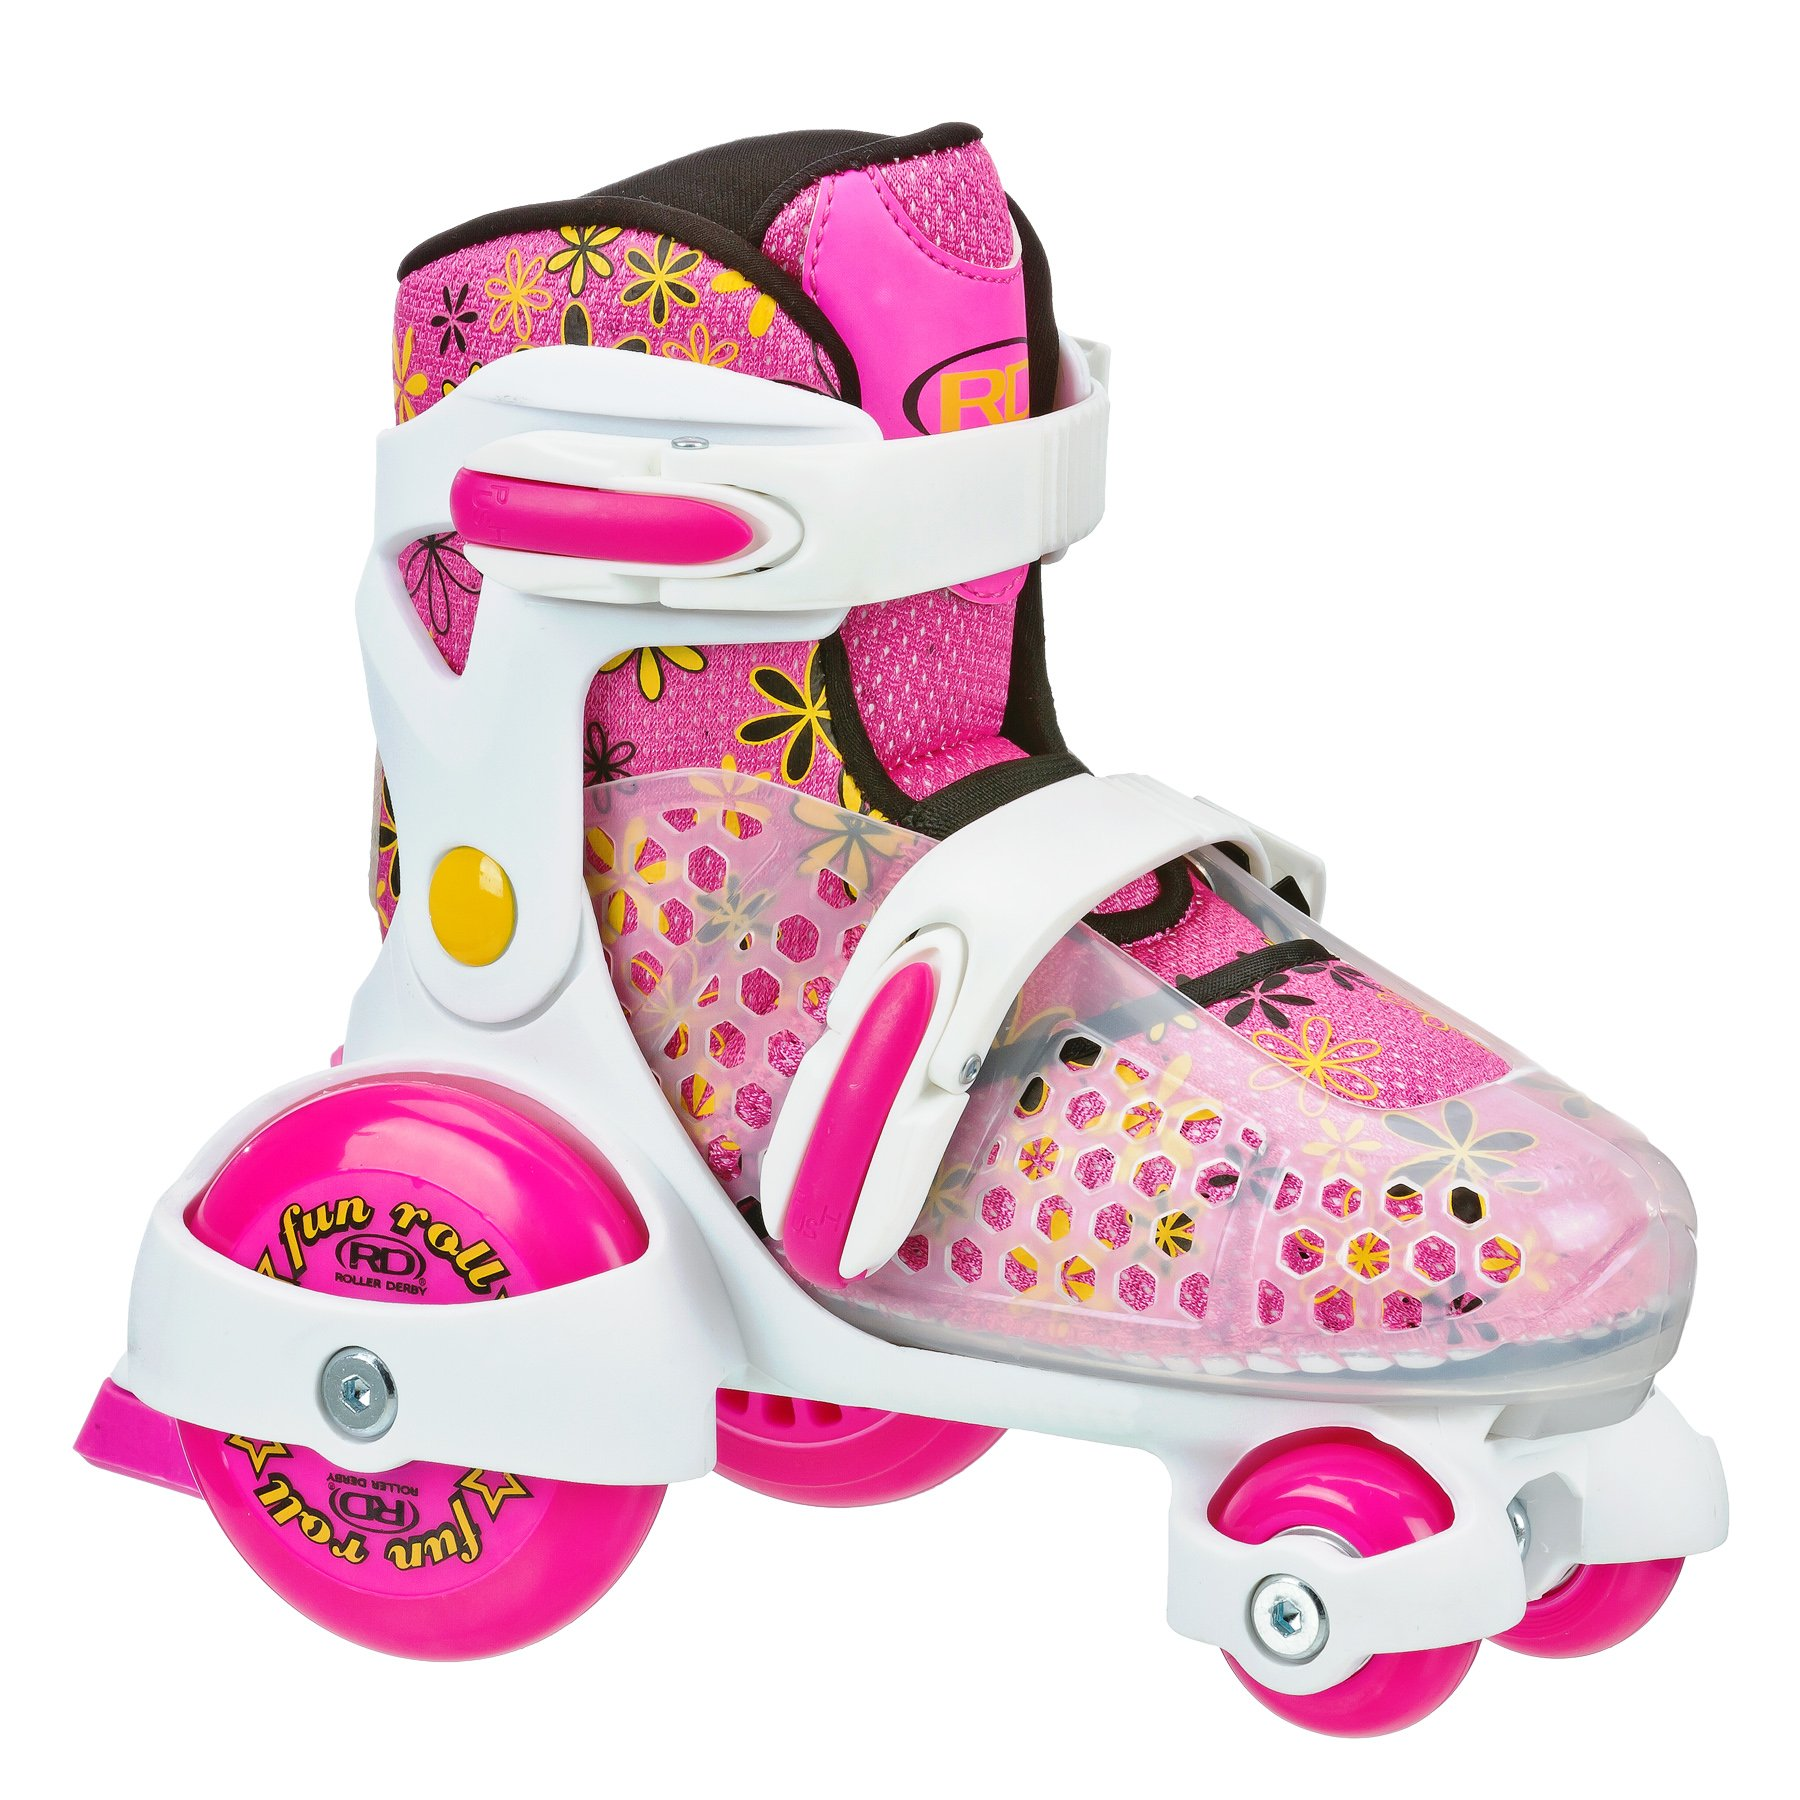 Roller Derby Girl's Fun Roll Adjustable Roller Skate, Small (7-11) by Roller Derby